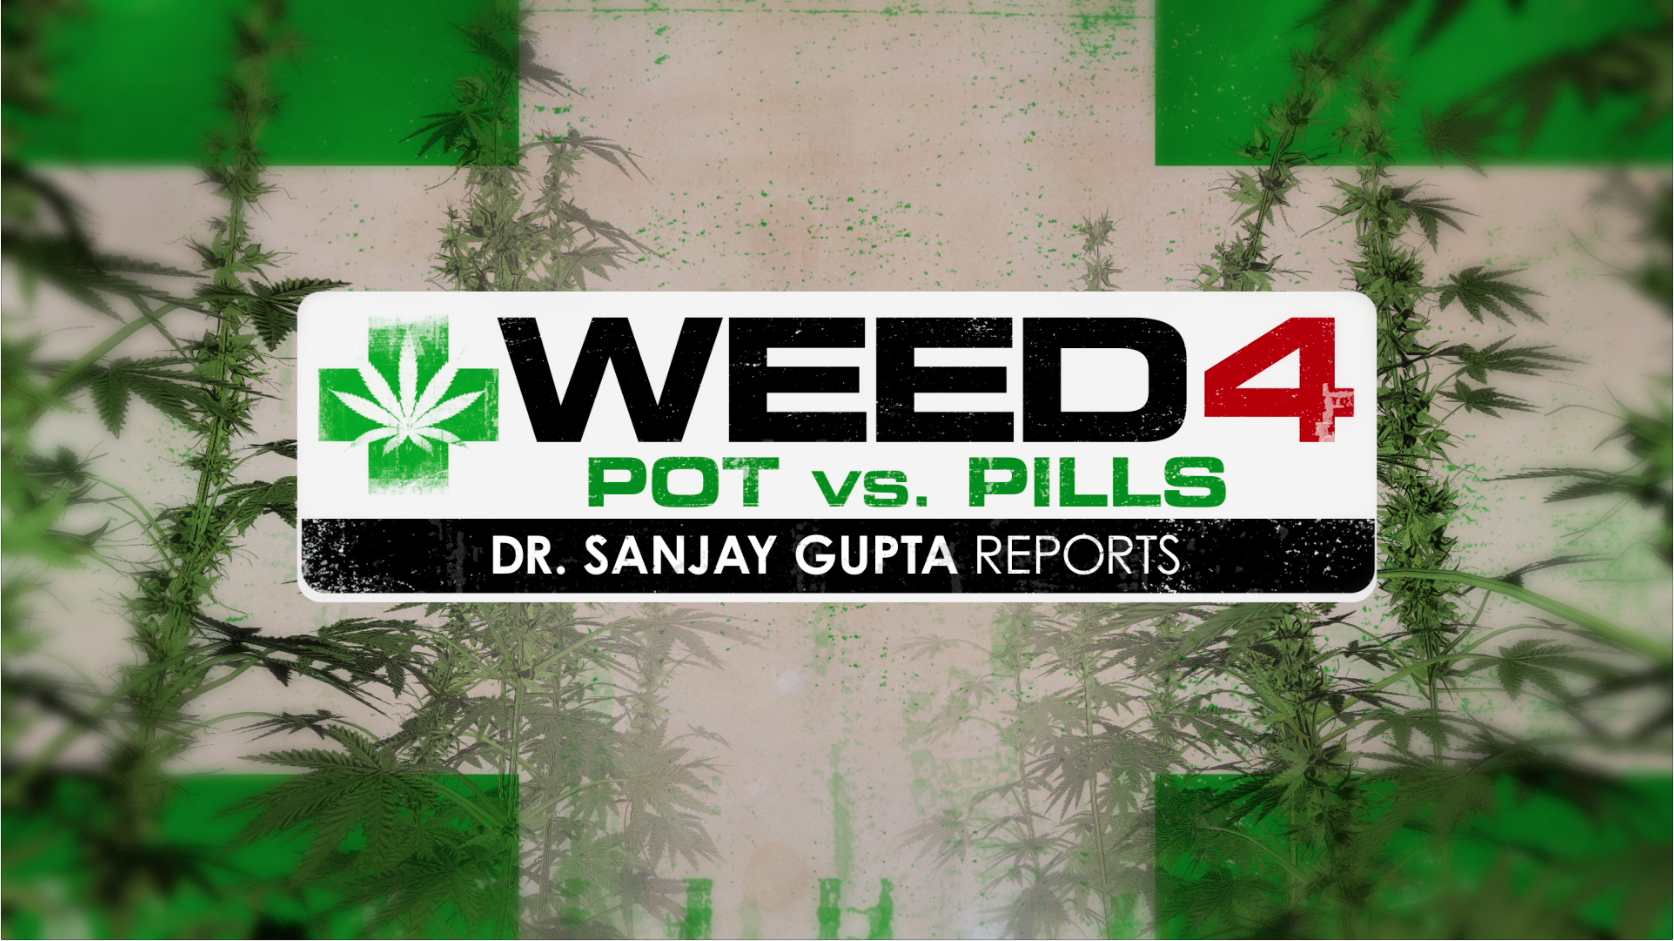 Sajay Gupta - Cannabis as a cure for opioid addiction